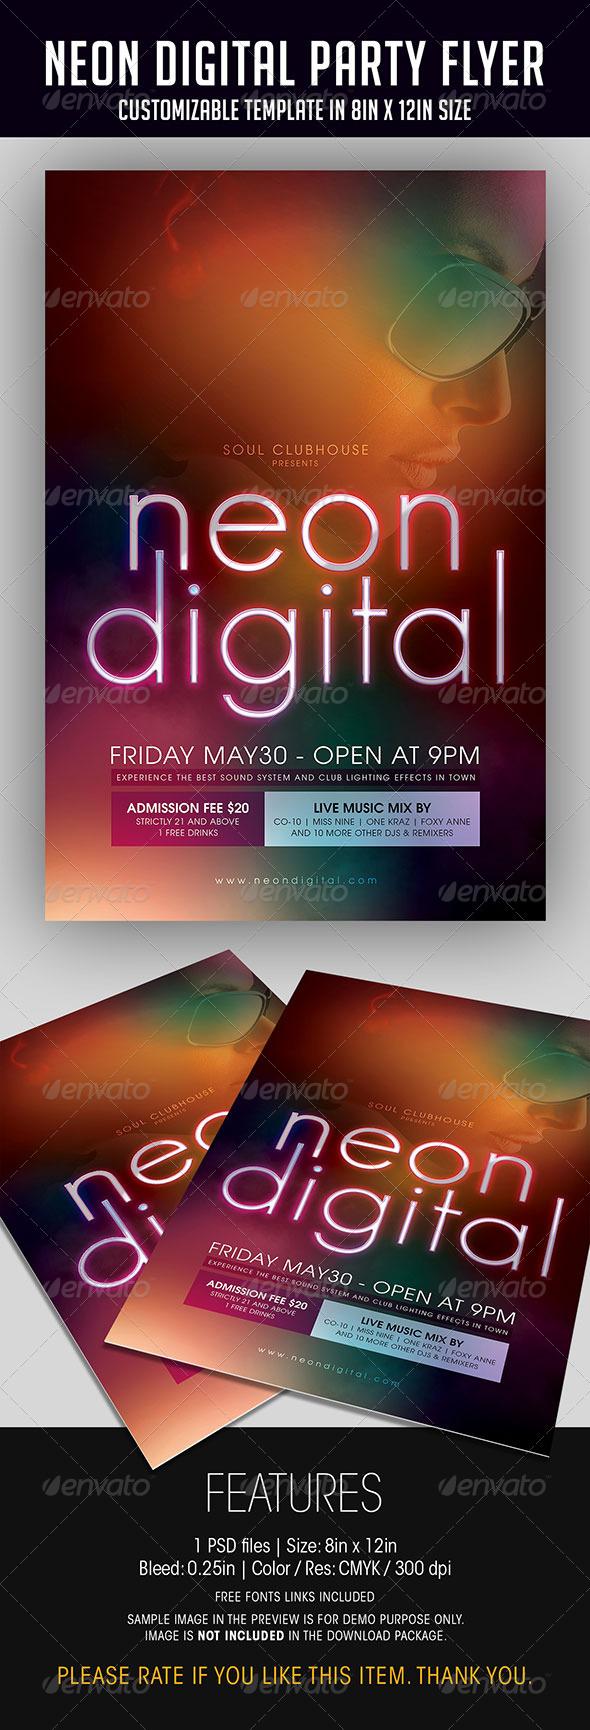 GraphicRiver Neon Digital Party Flyer 7025589